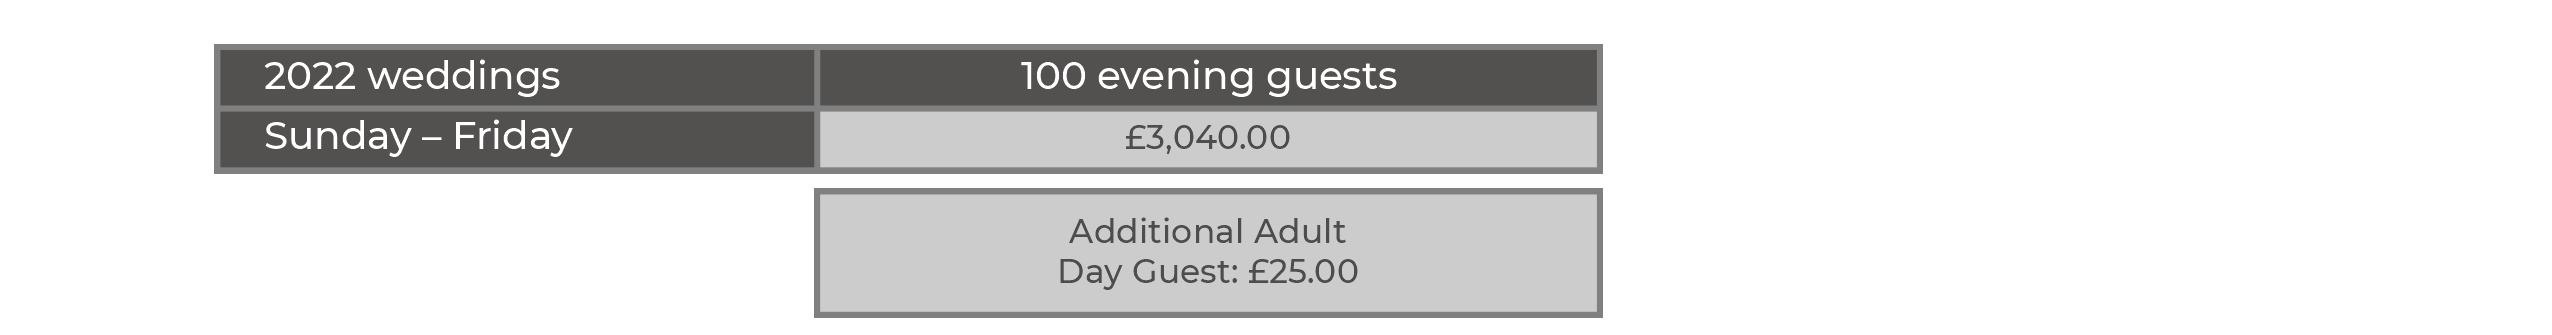 Evening Only Wedding Package Prices Bredbury Hall Stockport Preston